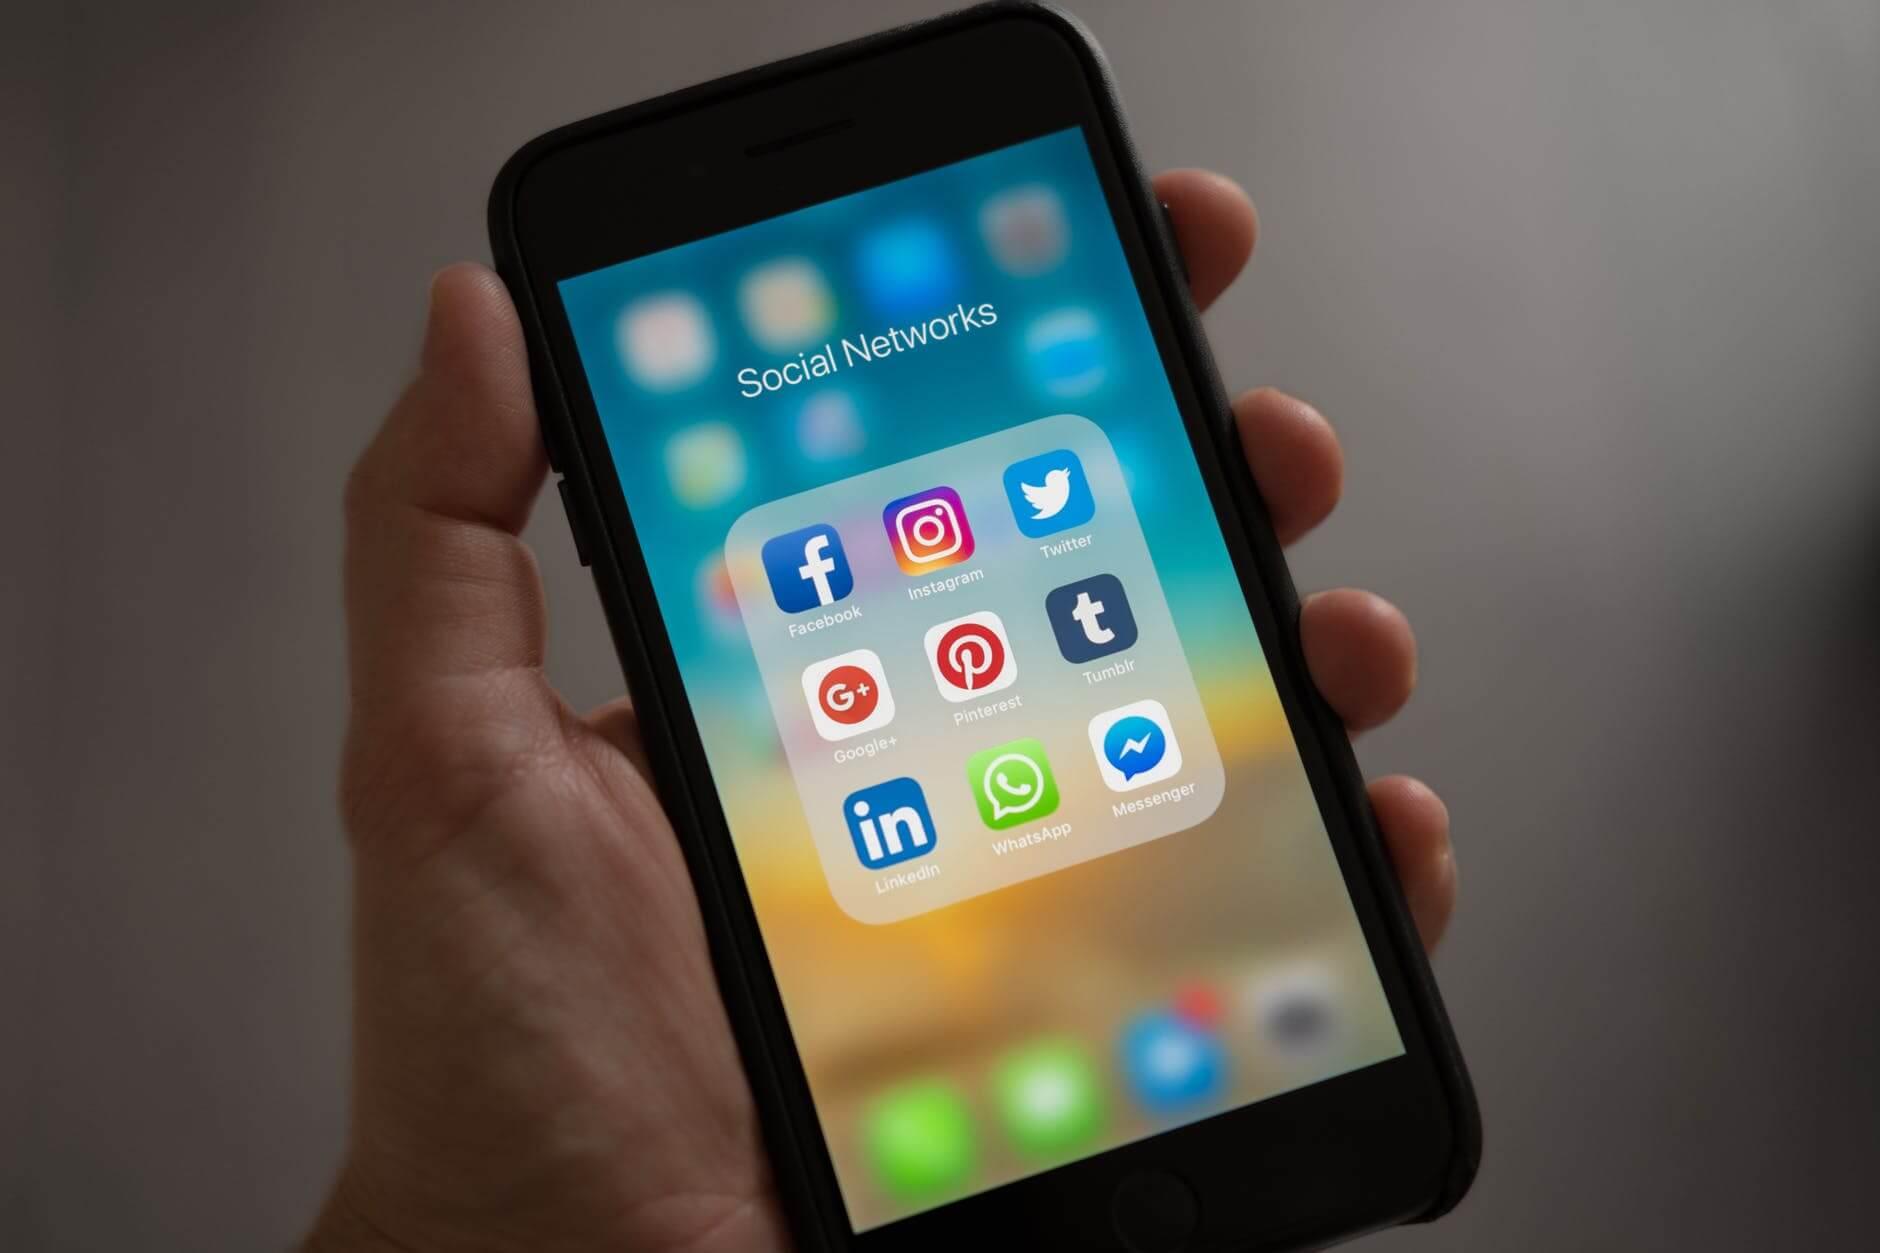 studi-menunjukkan-aplikasi-media-sosial-dapat-meningkatkan-perasaan-terisolasi